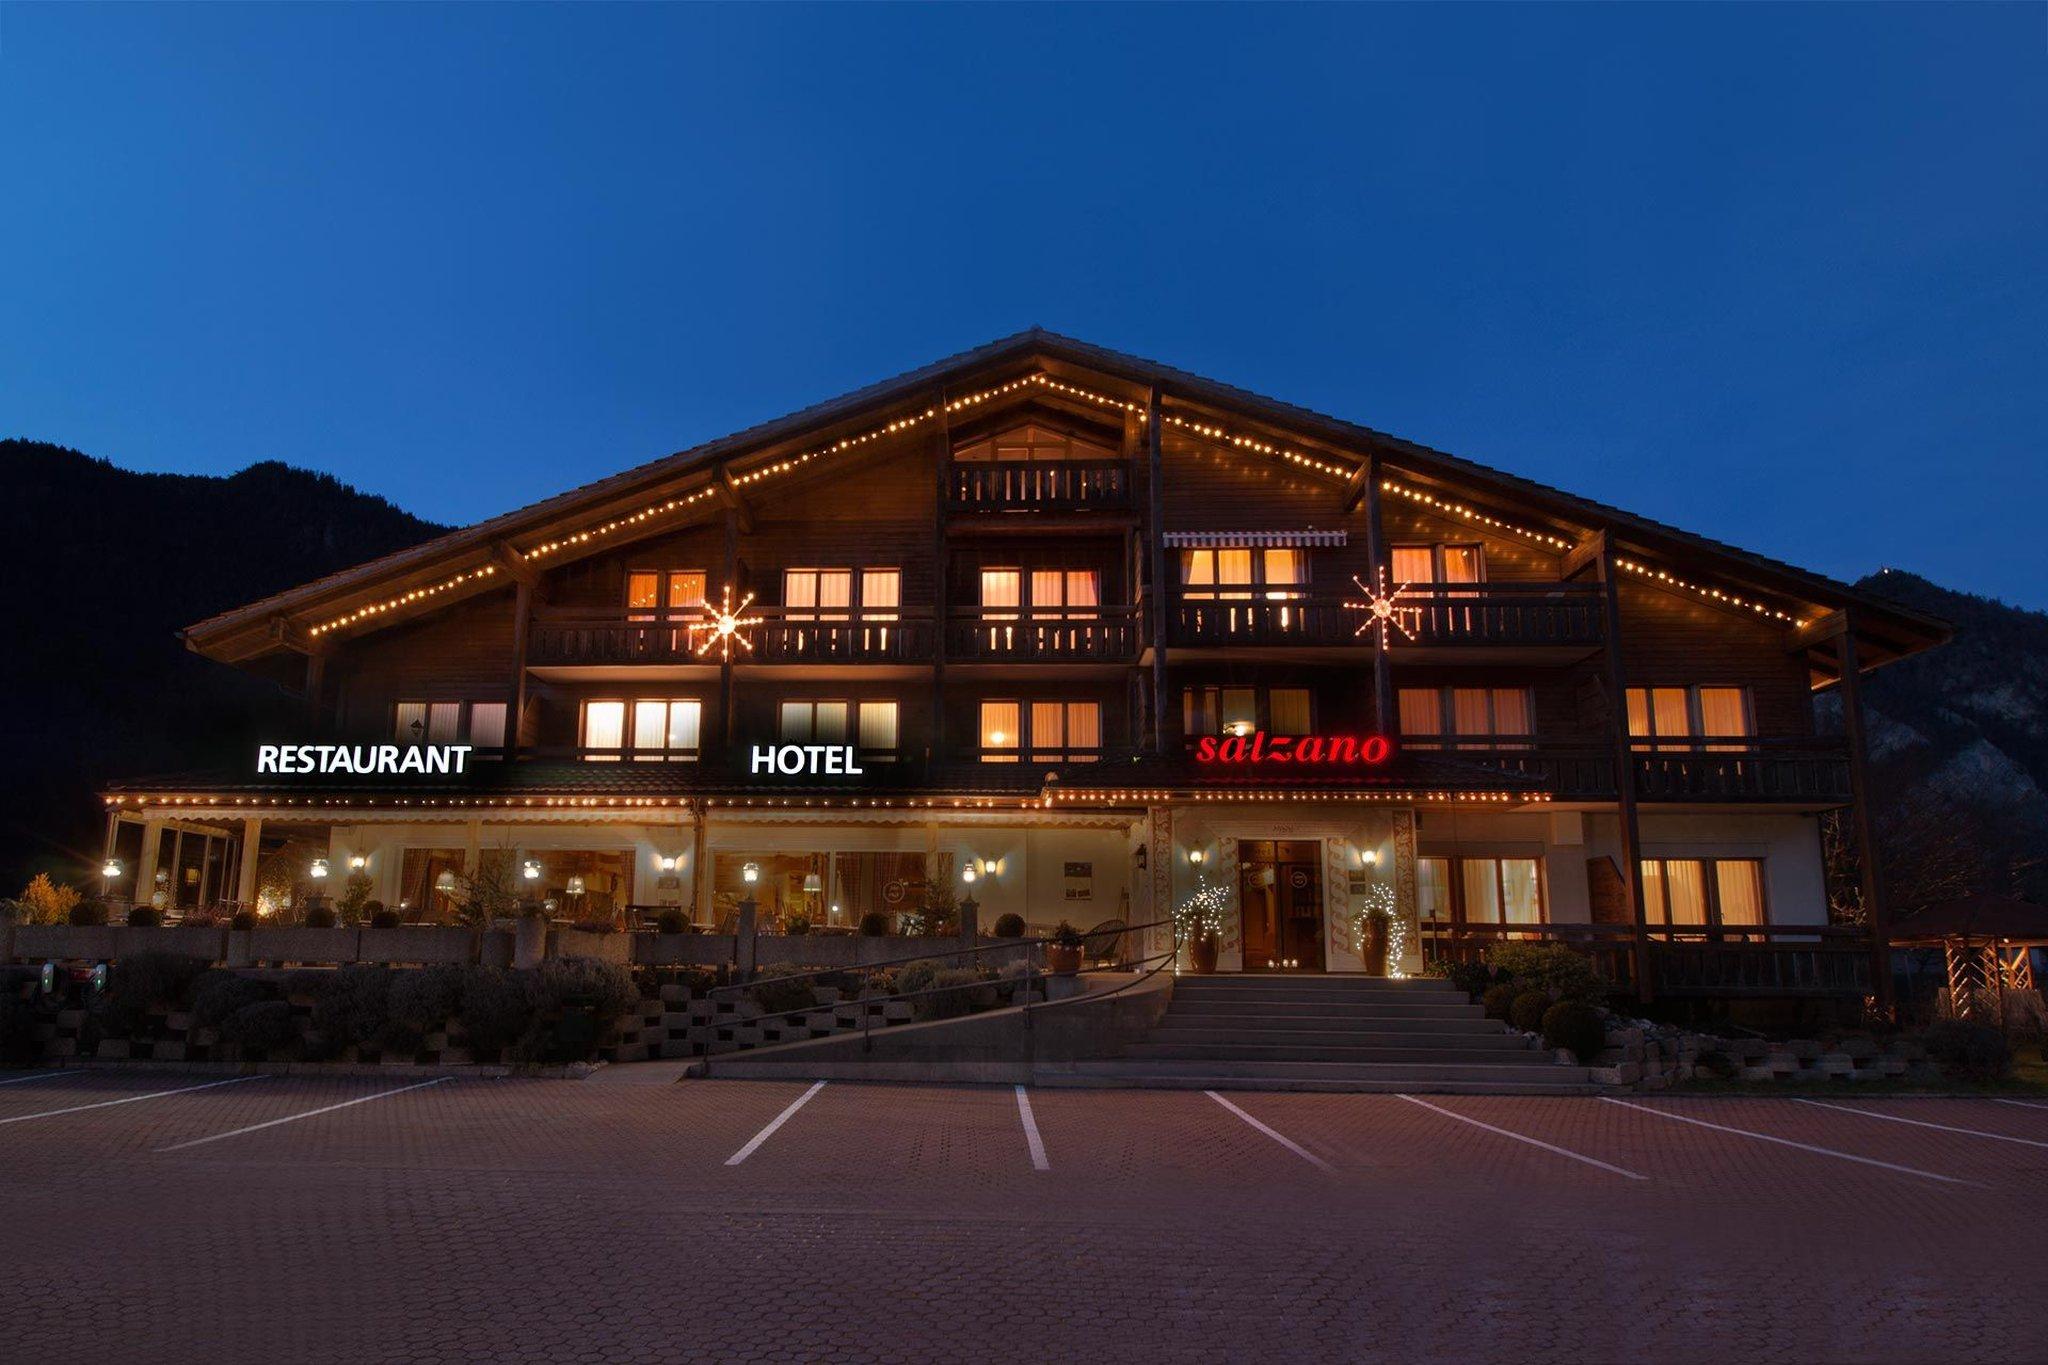 Landhotel Golf and Salzano SPA